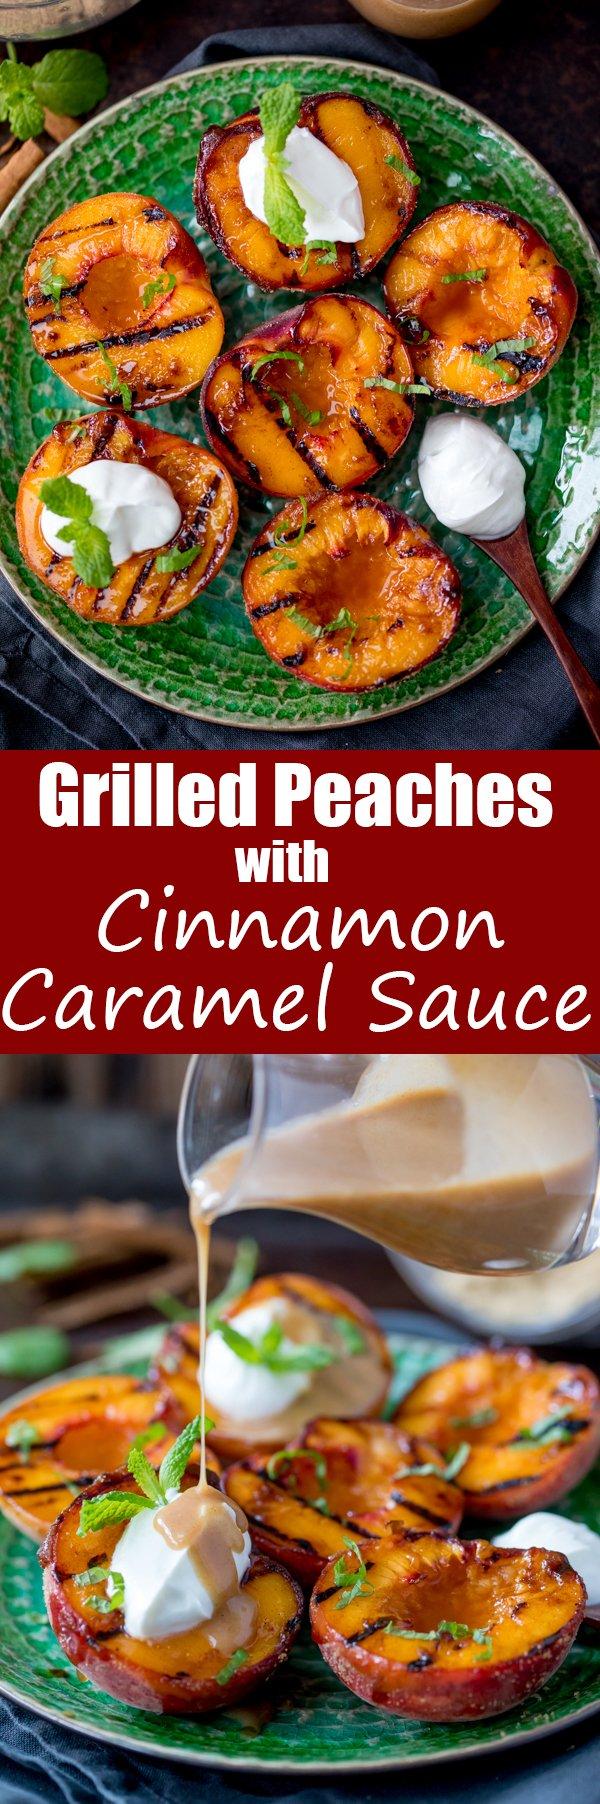 cinnamon grilled peaches cinnamon caramel sauce pin